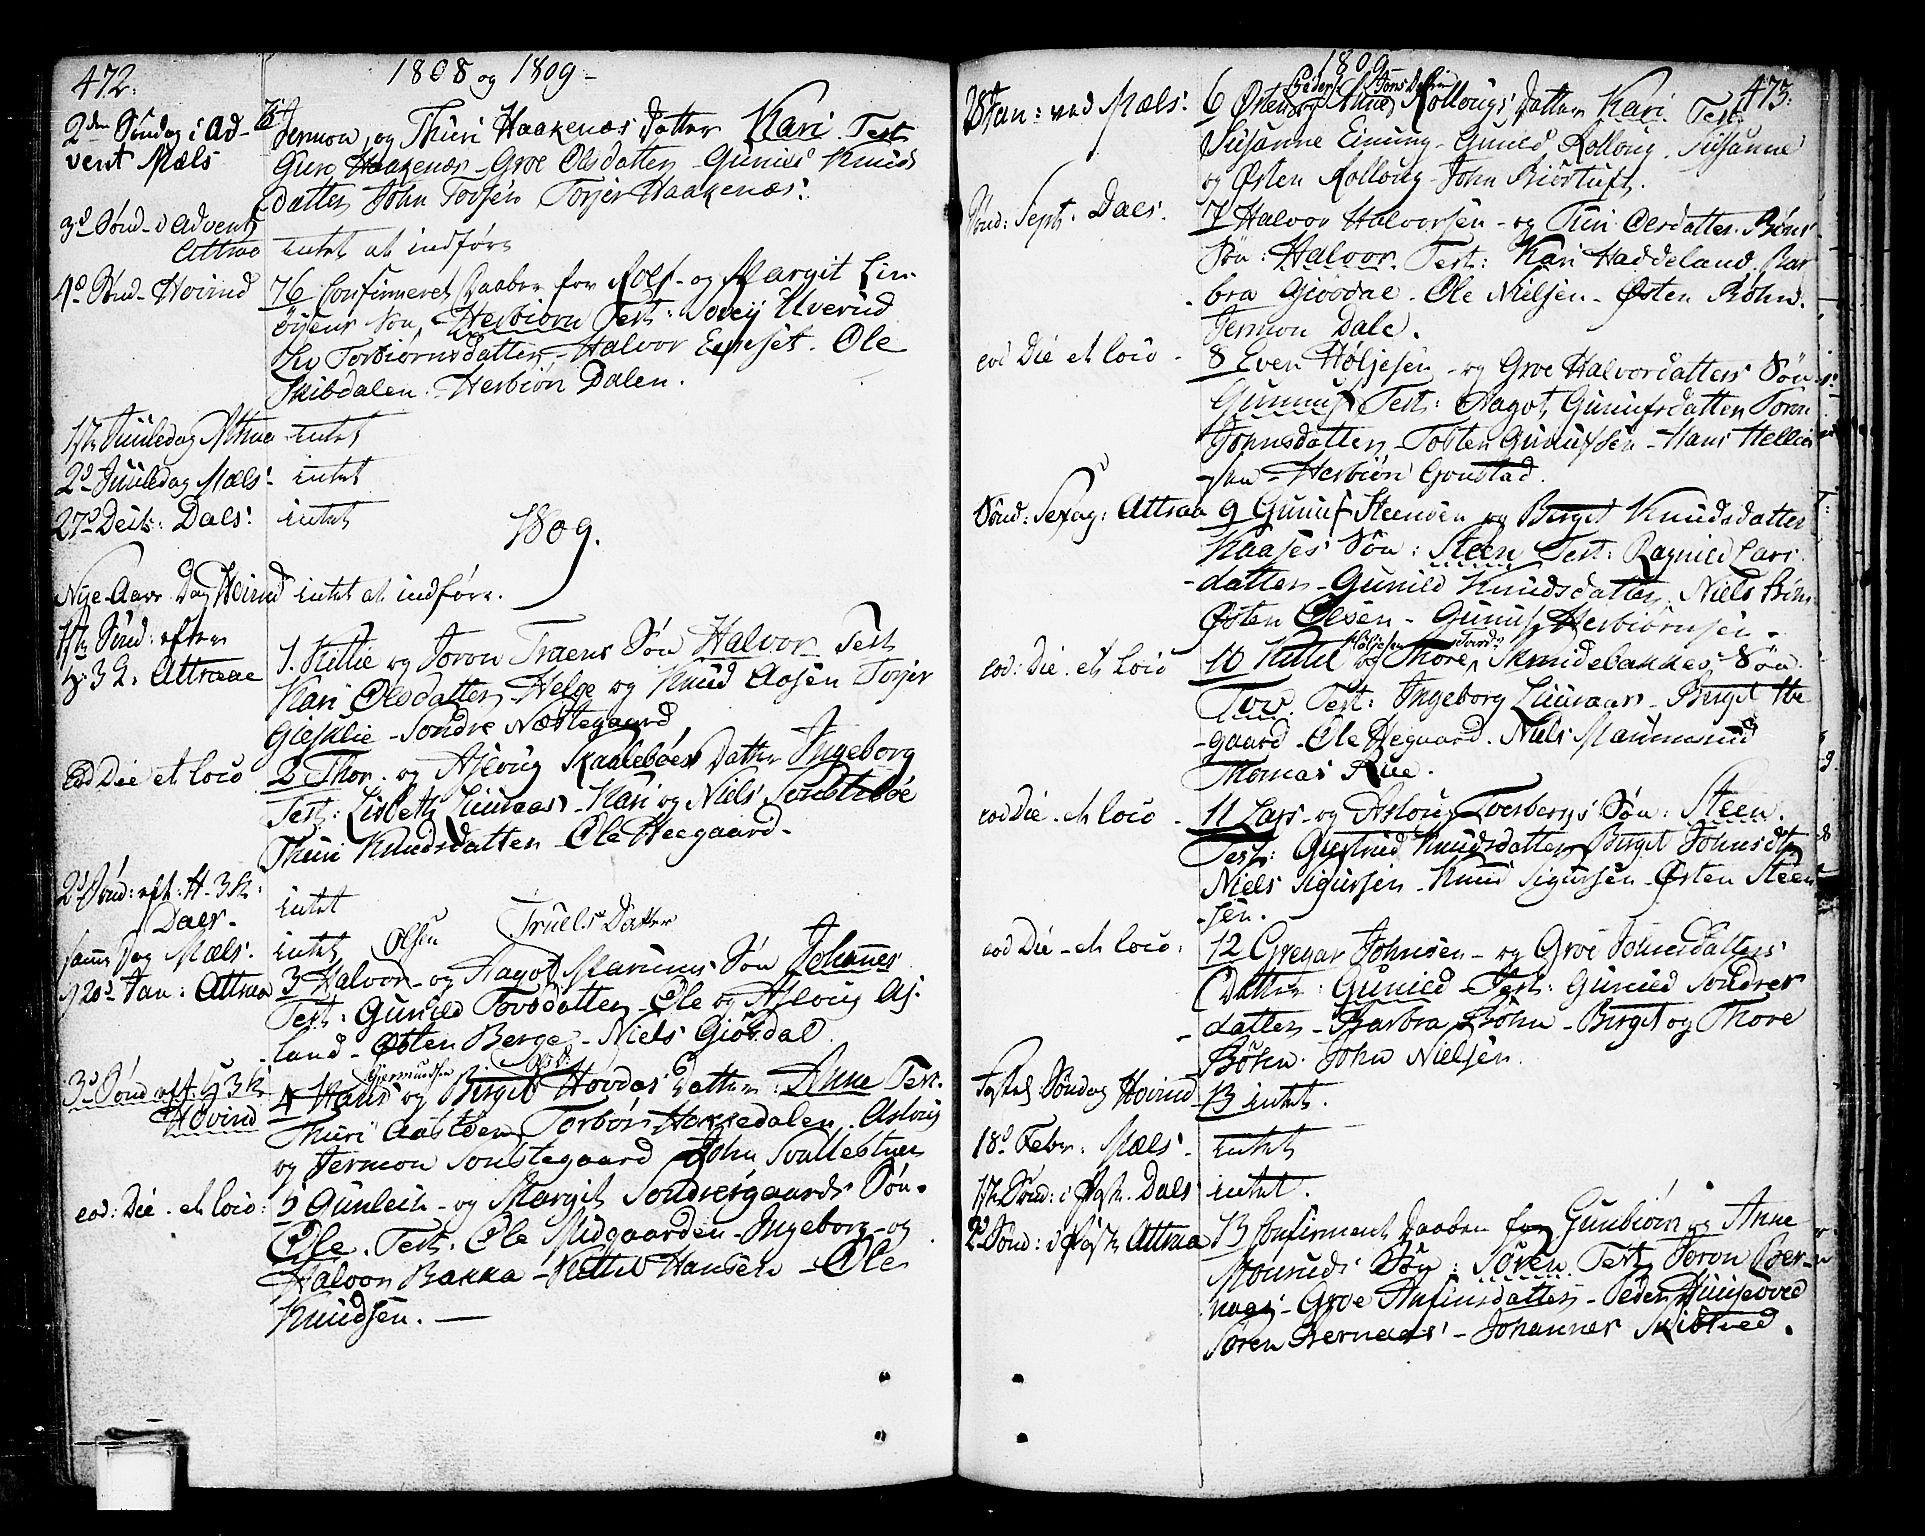 SAKO, Tinn kirkebøker, F/Fa/L0002: Ministerialbok nr. I 2, 1757-1810, s. 472-473